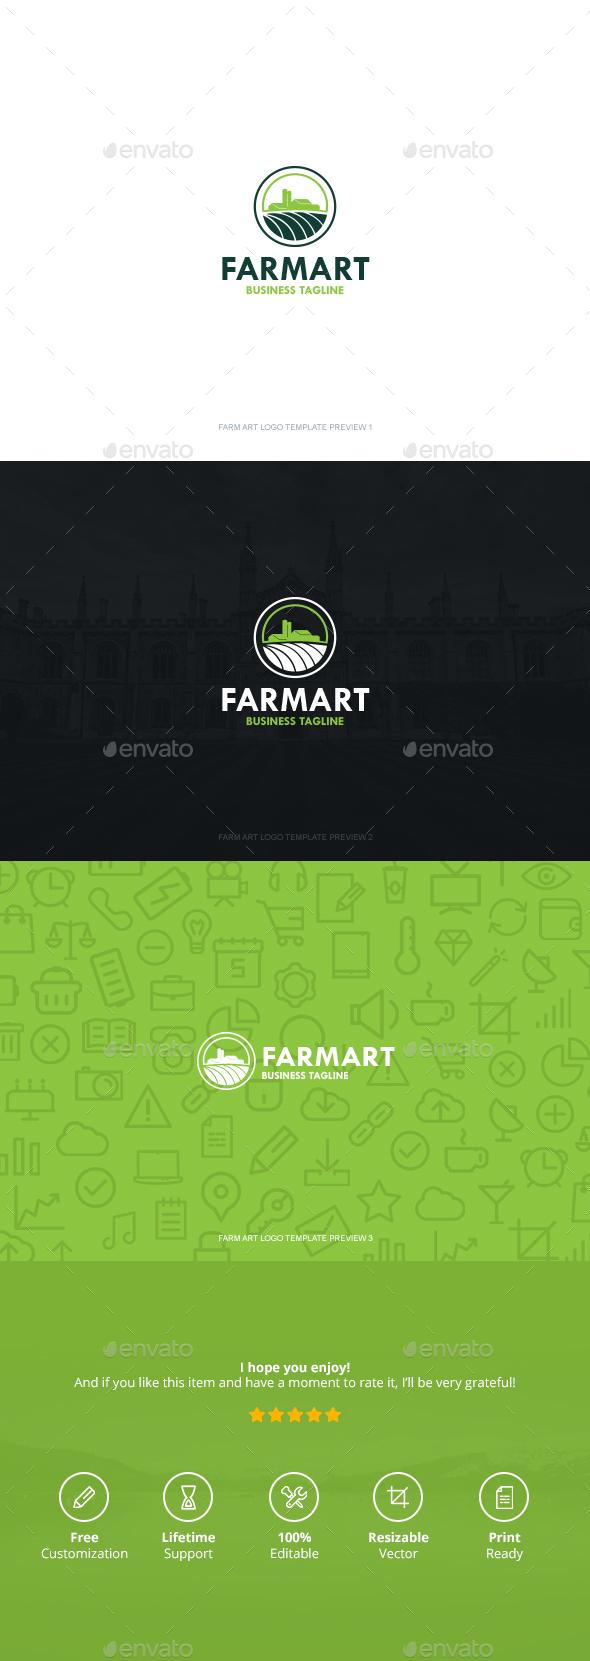 Farm Art Logo - Symbols Logo Templates